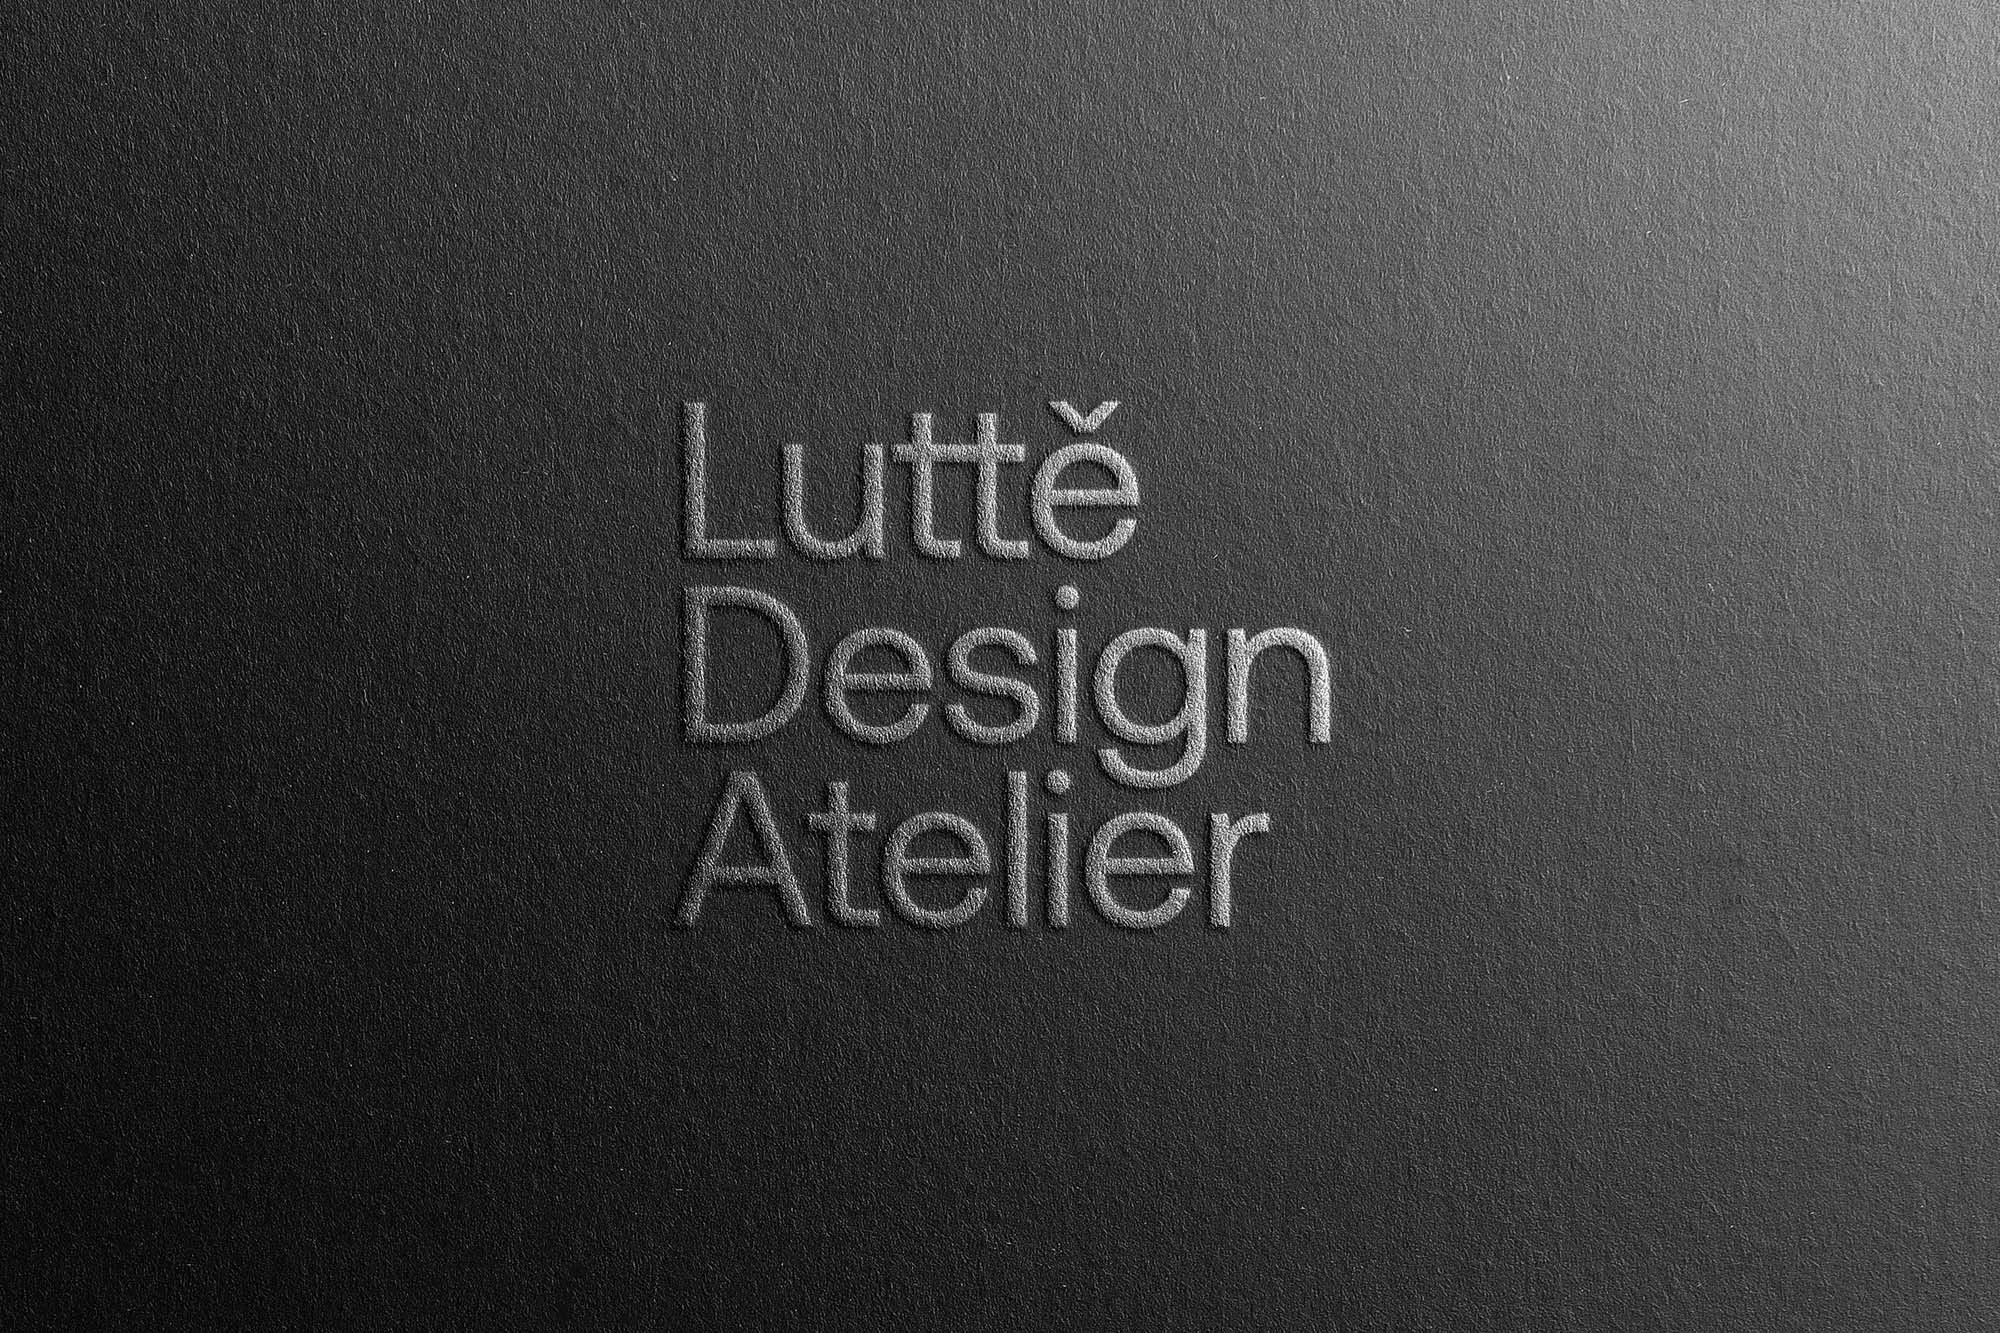 Lutte Design Atelier Identity by Widarto Impact